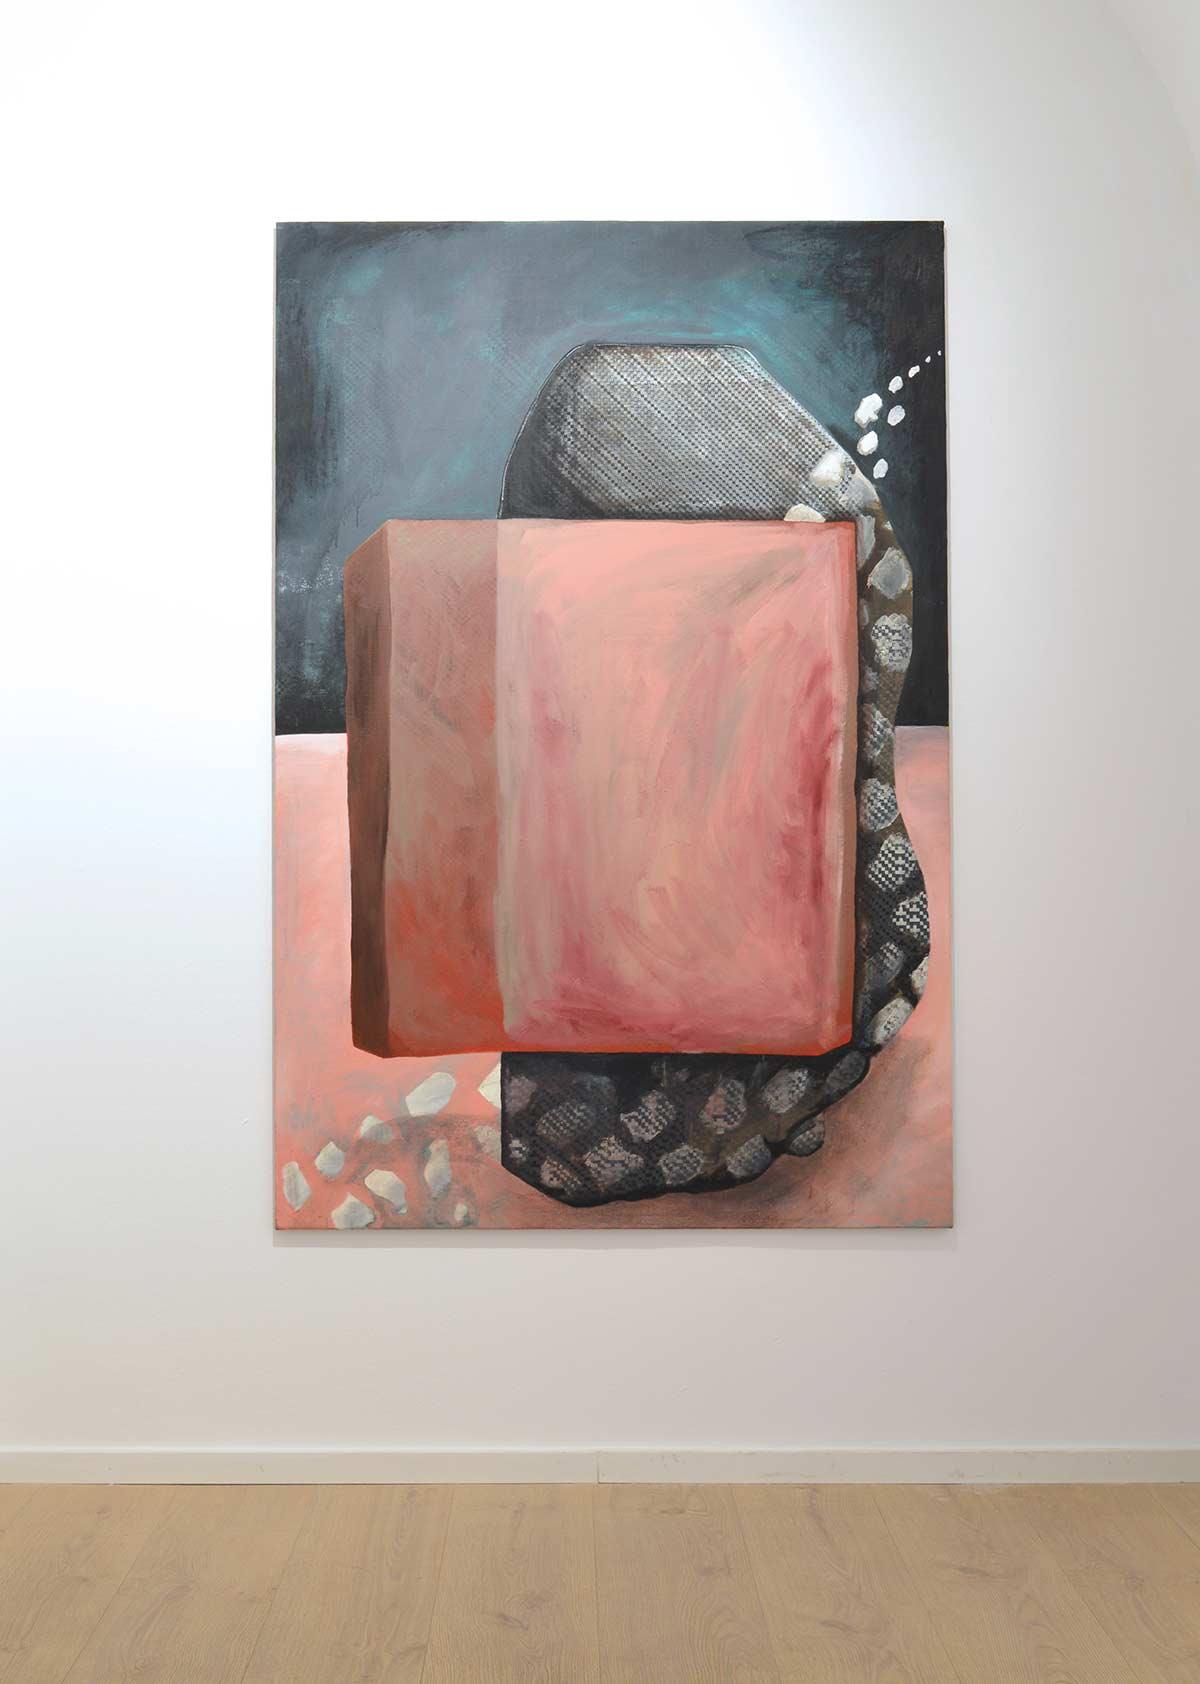 christian murzek, desiderio gallery, vienna, viewing room